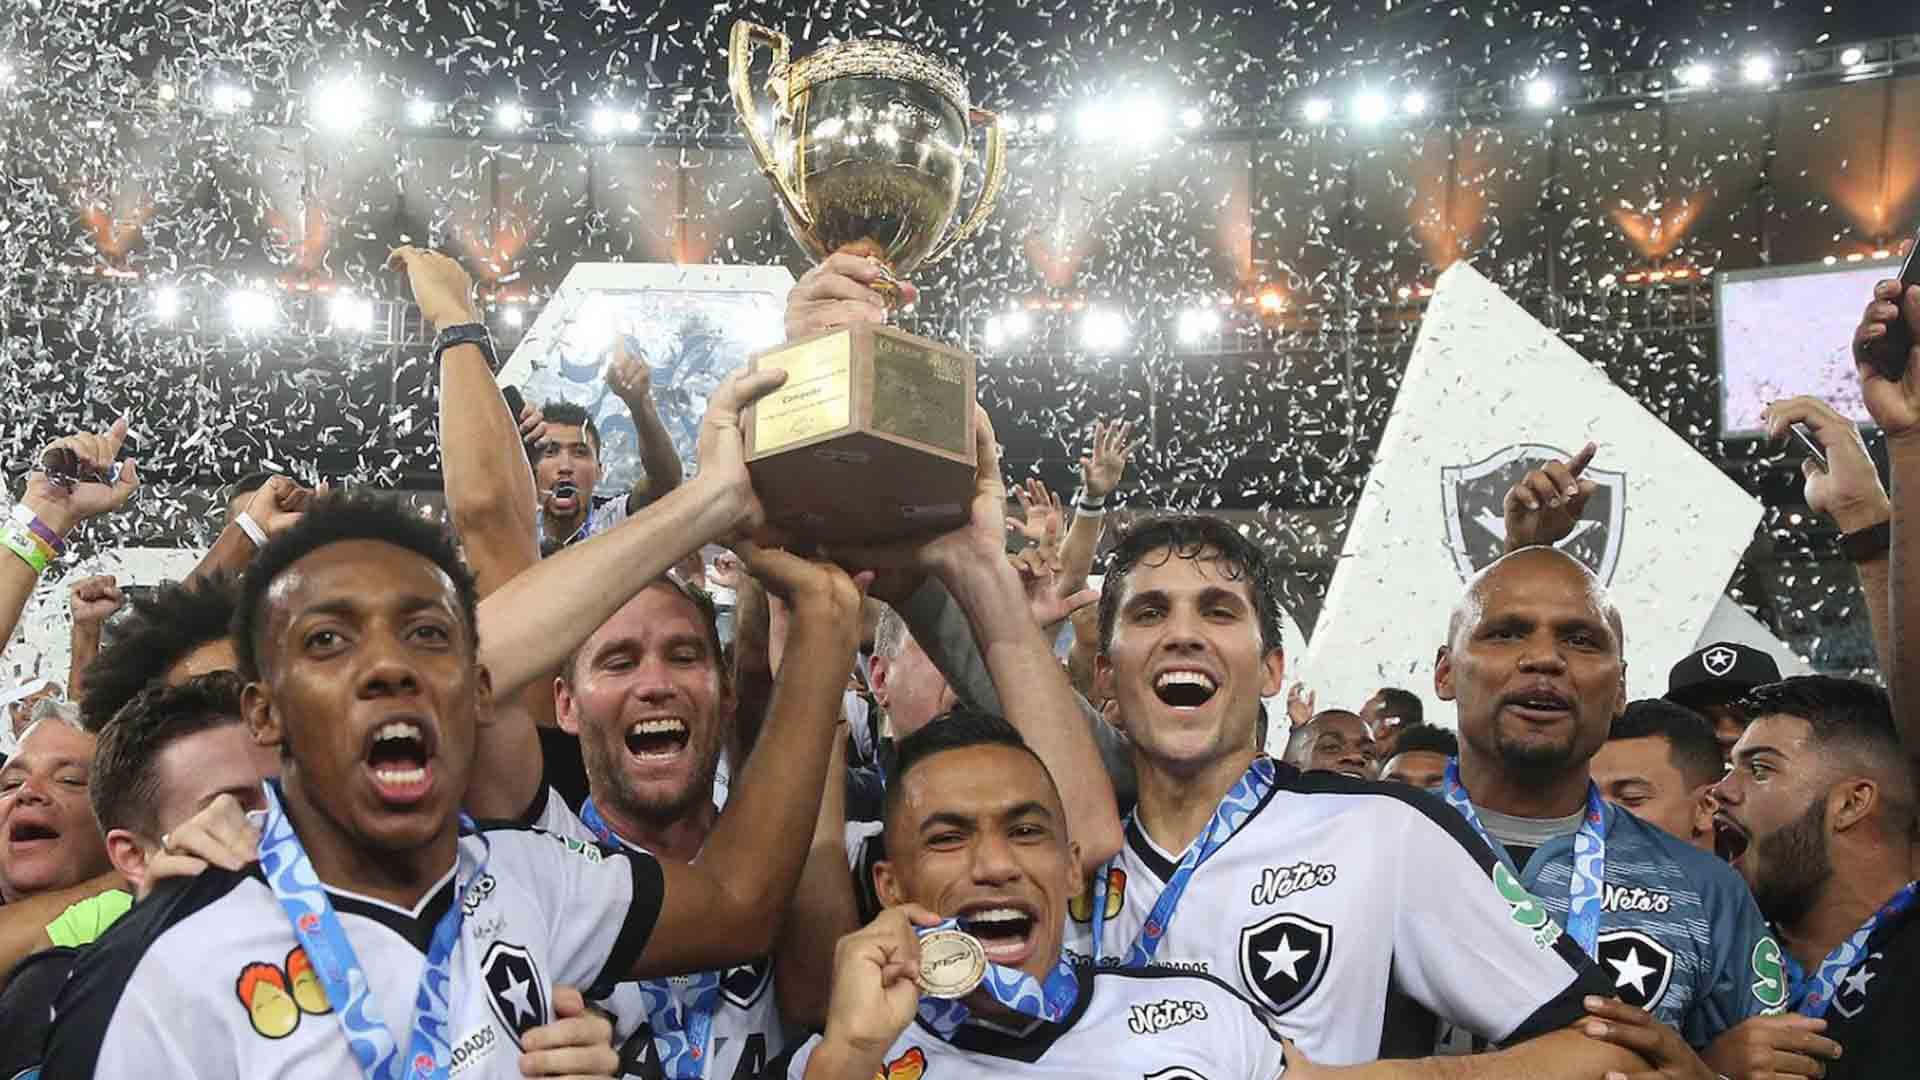 o que é campeonato carioca